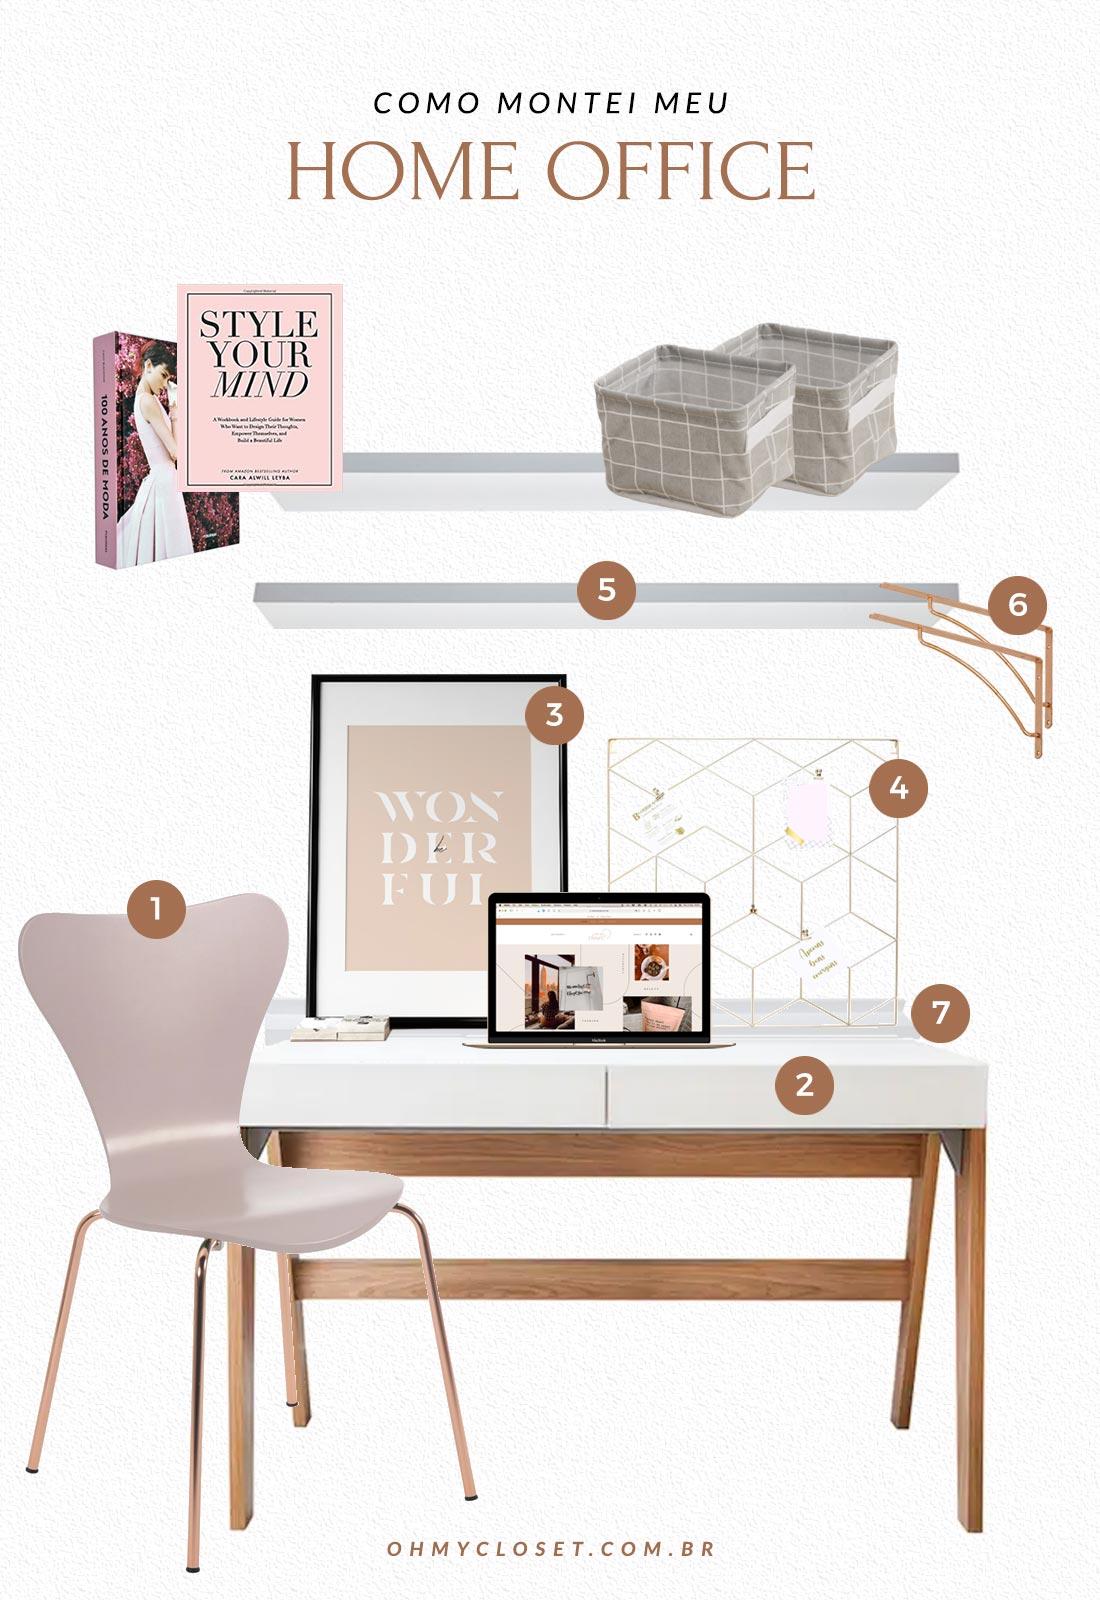 Infográfico items para montar home office gastando pouco.